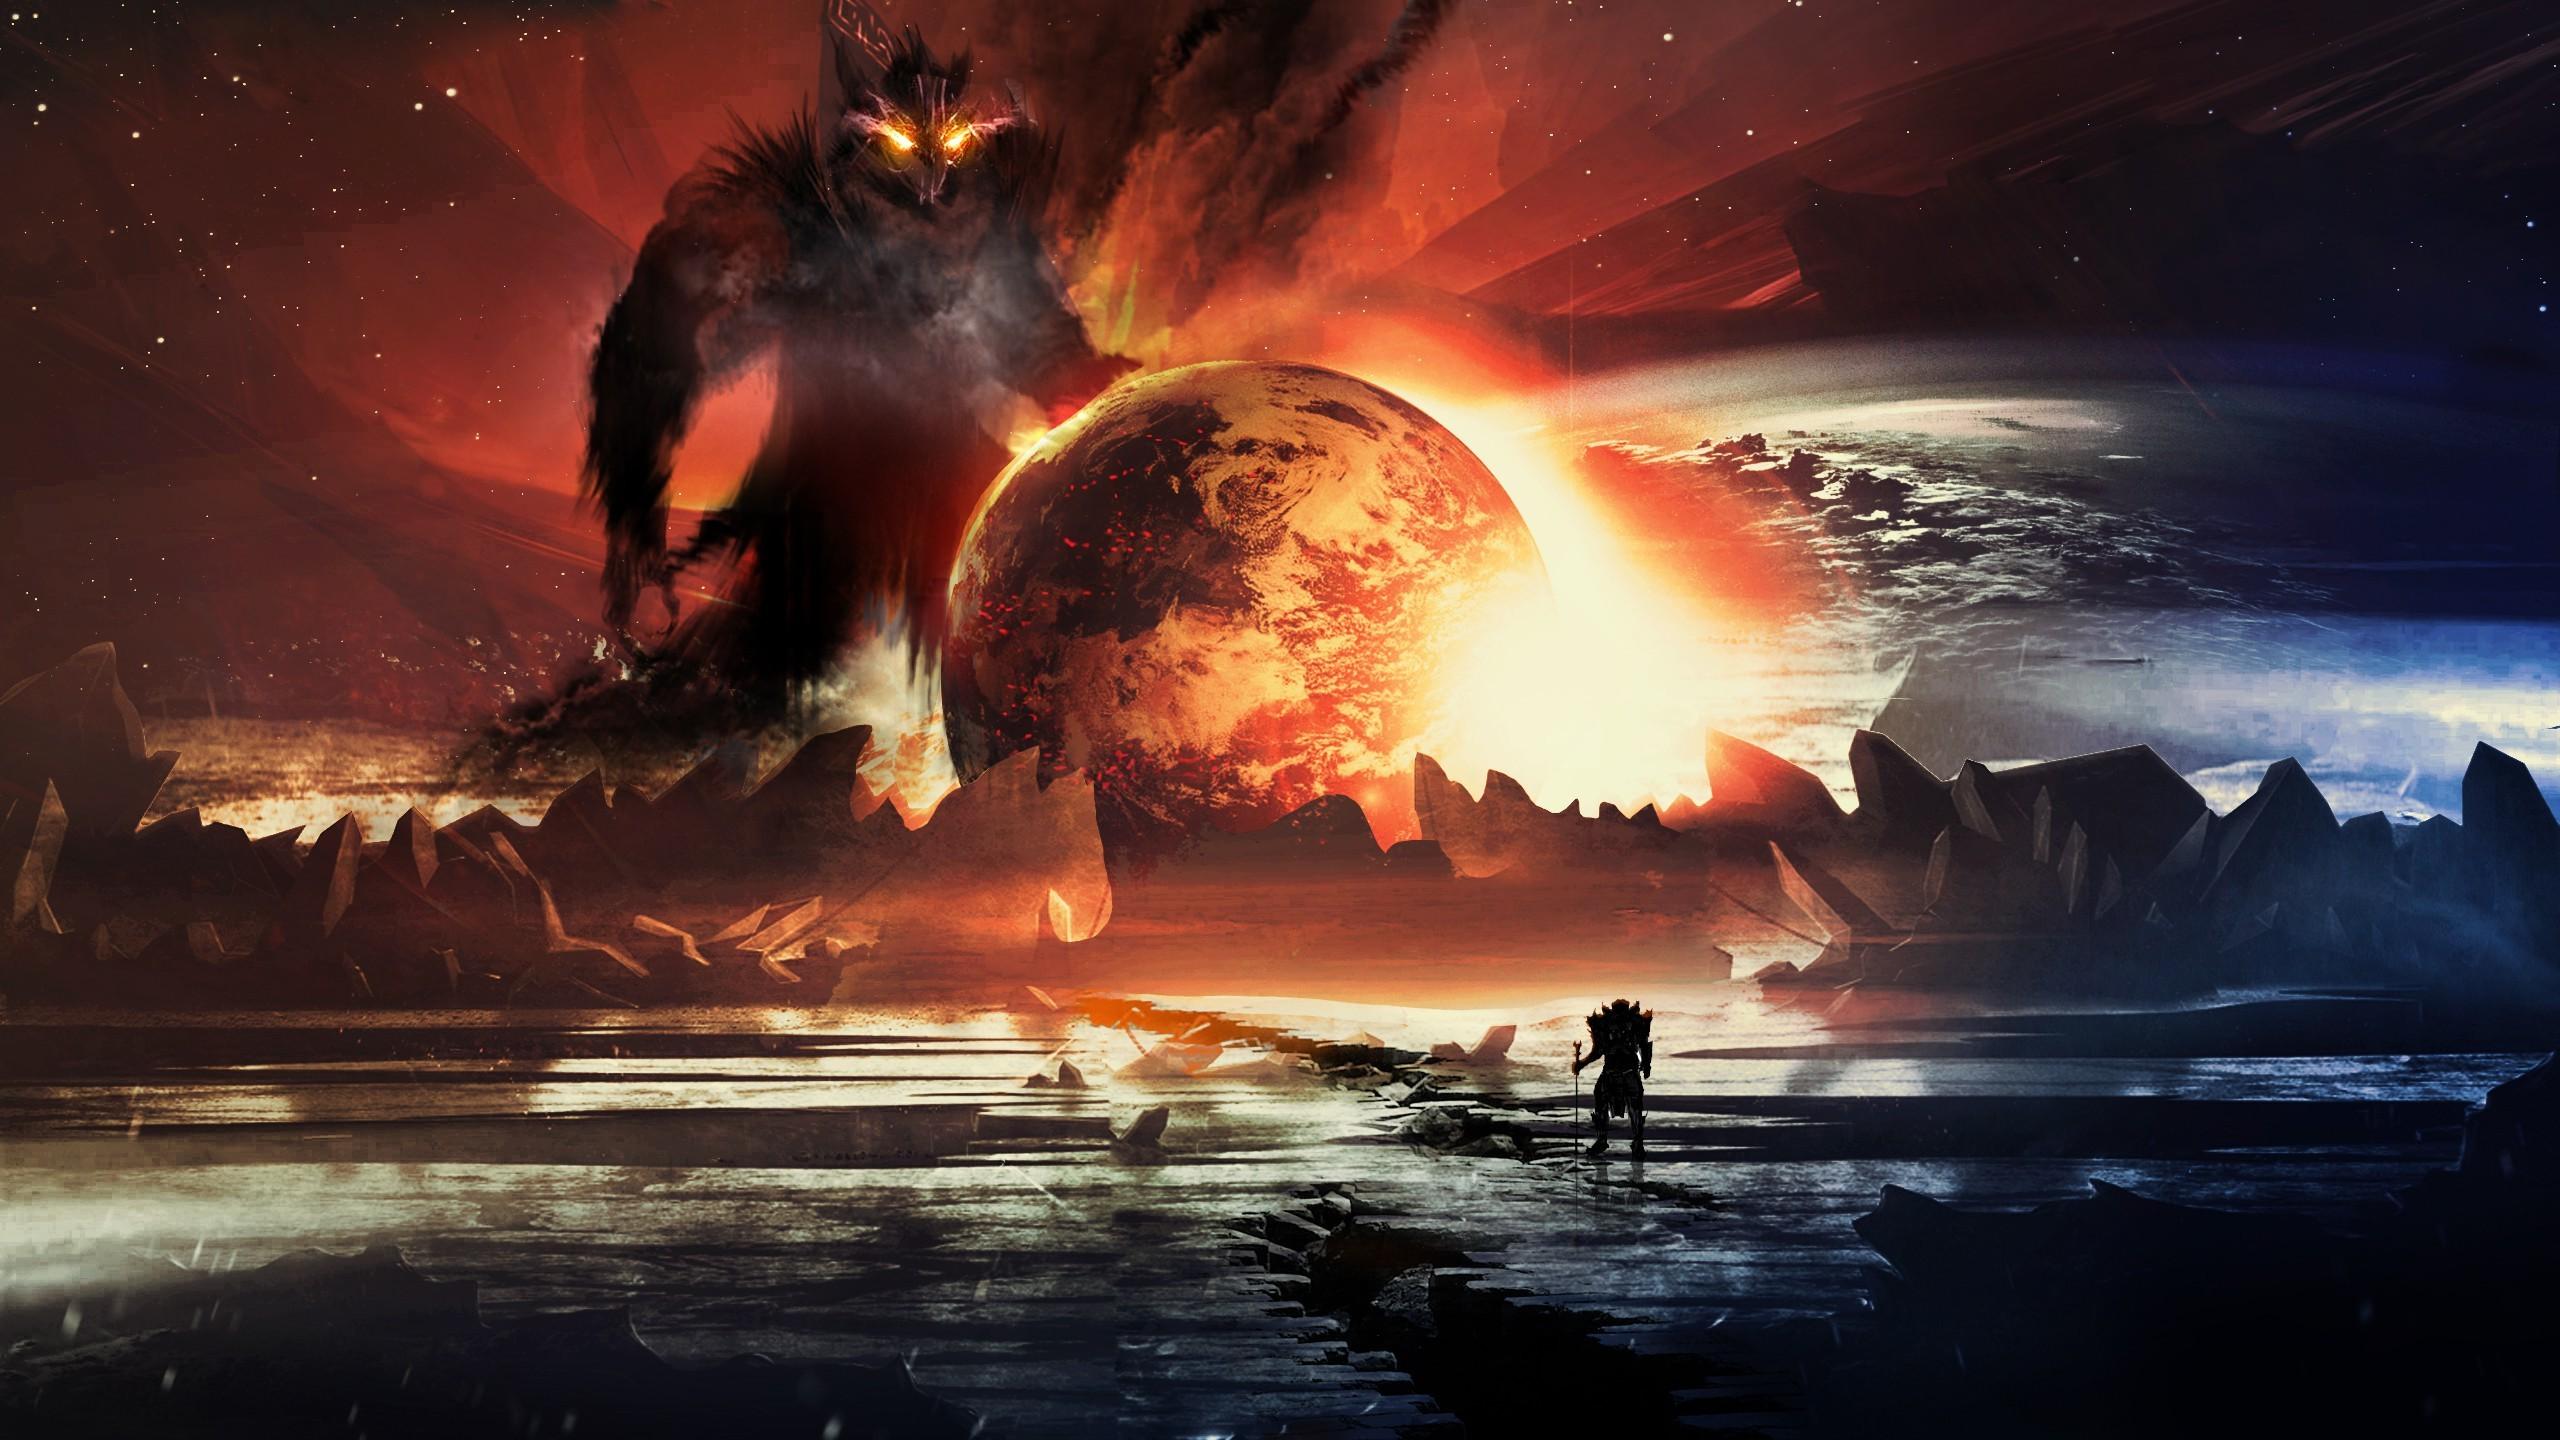 Creature 3d Movie Wallpaper Download Artwork Fantasy Art Digital Art Planet Warrior